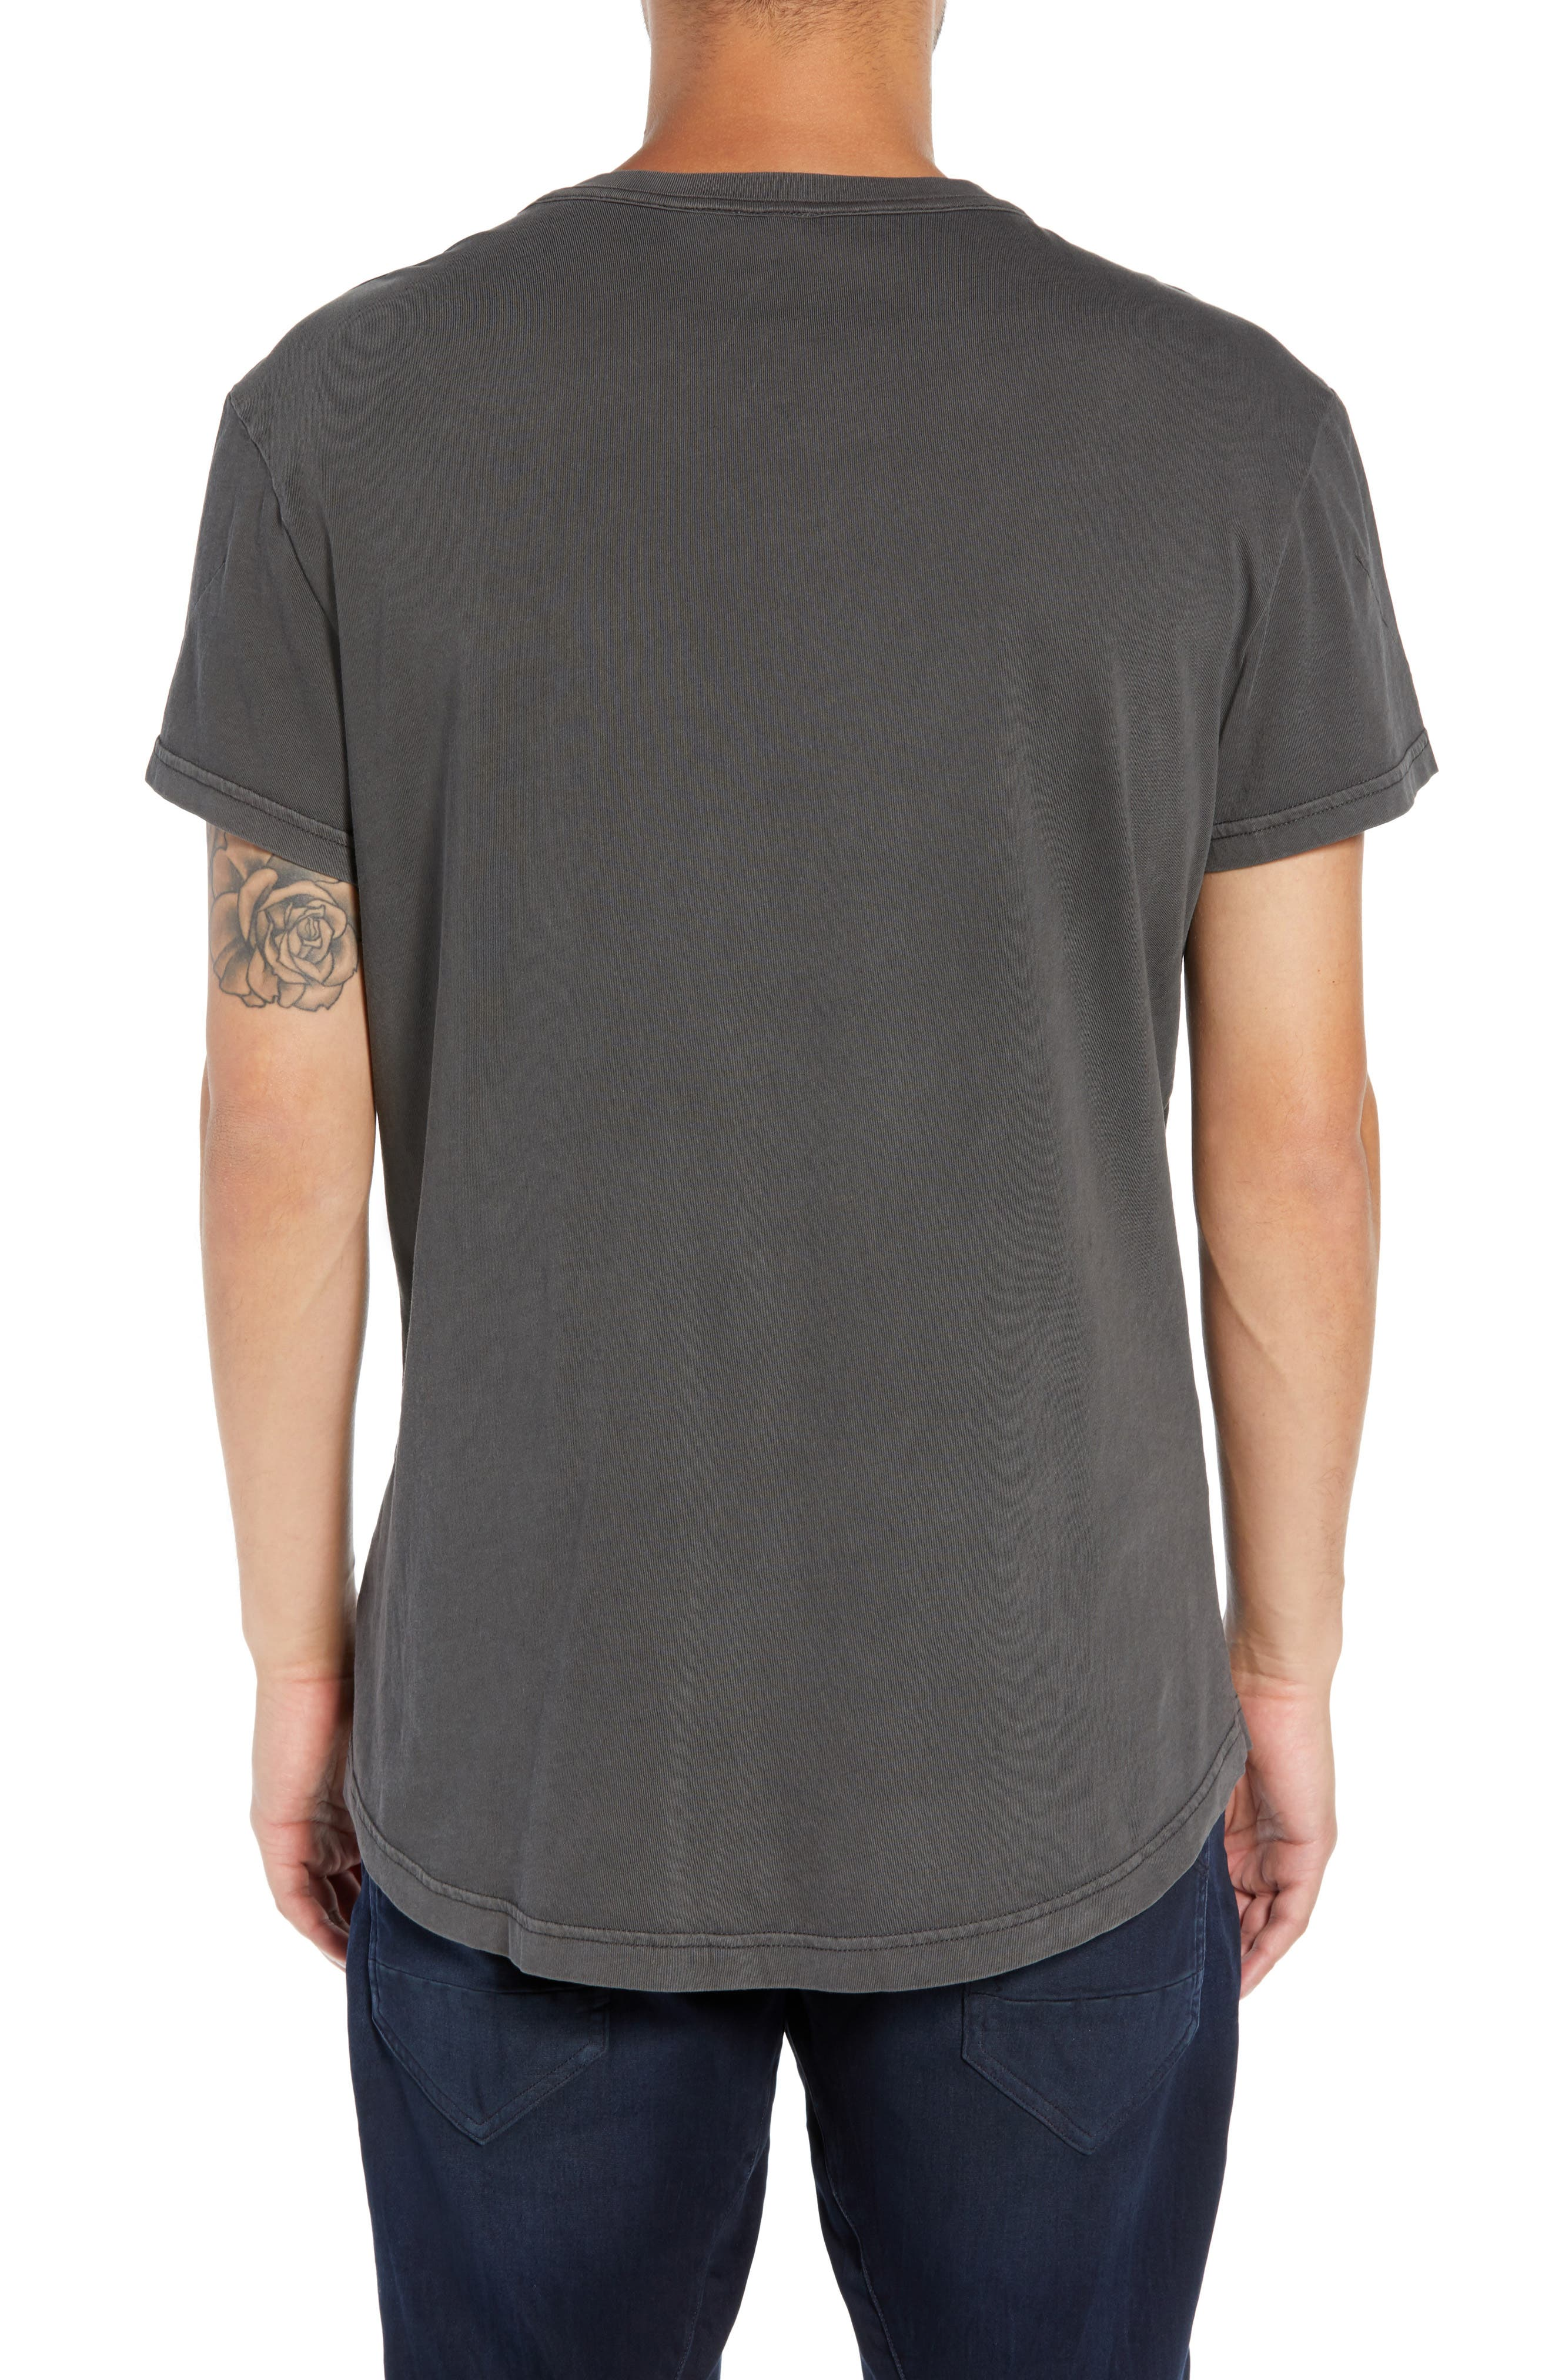 Starkton Solid V-Neck T-Shirt,                             Alternate thumbnail 2, color,                             DARK BLACK